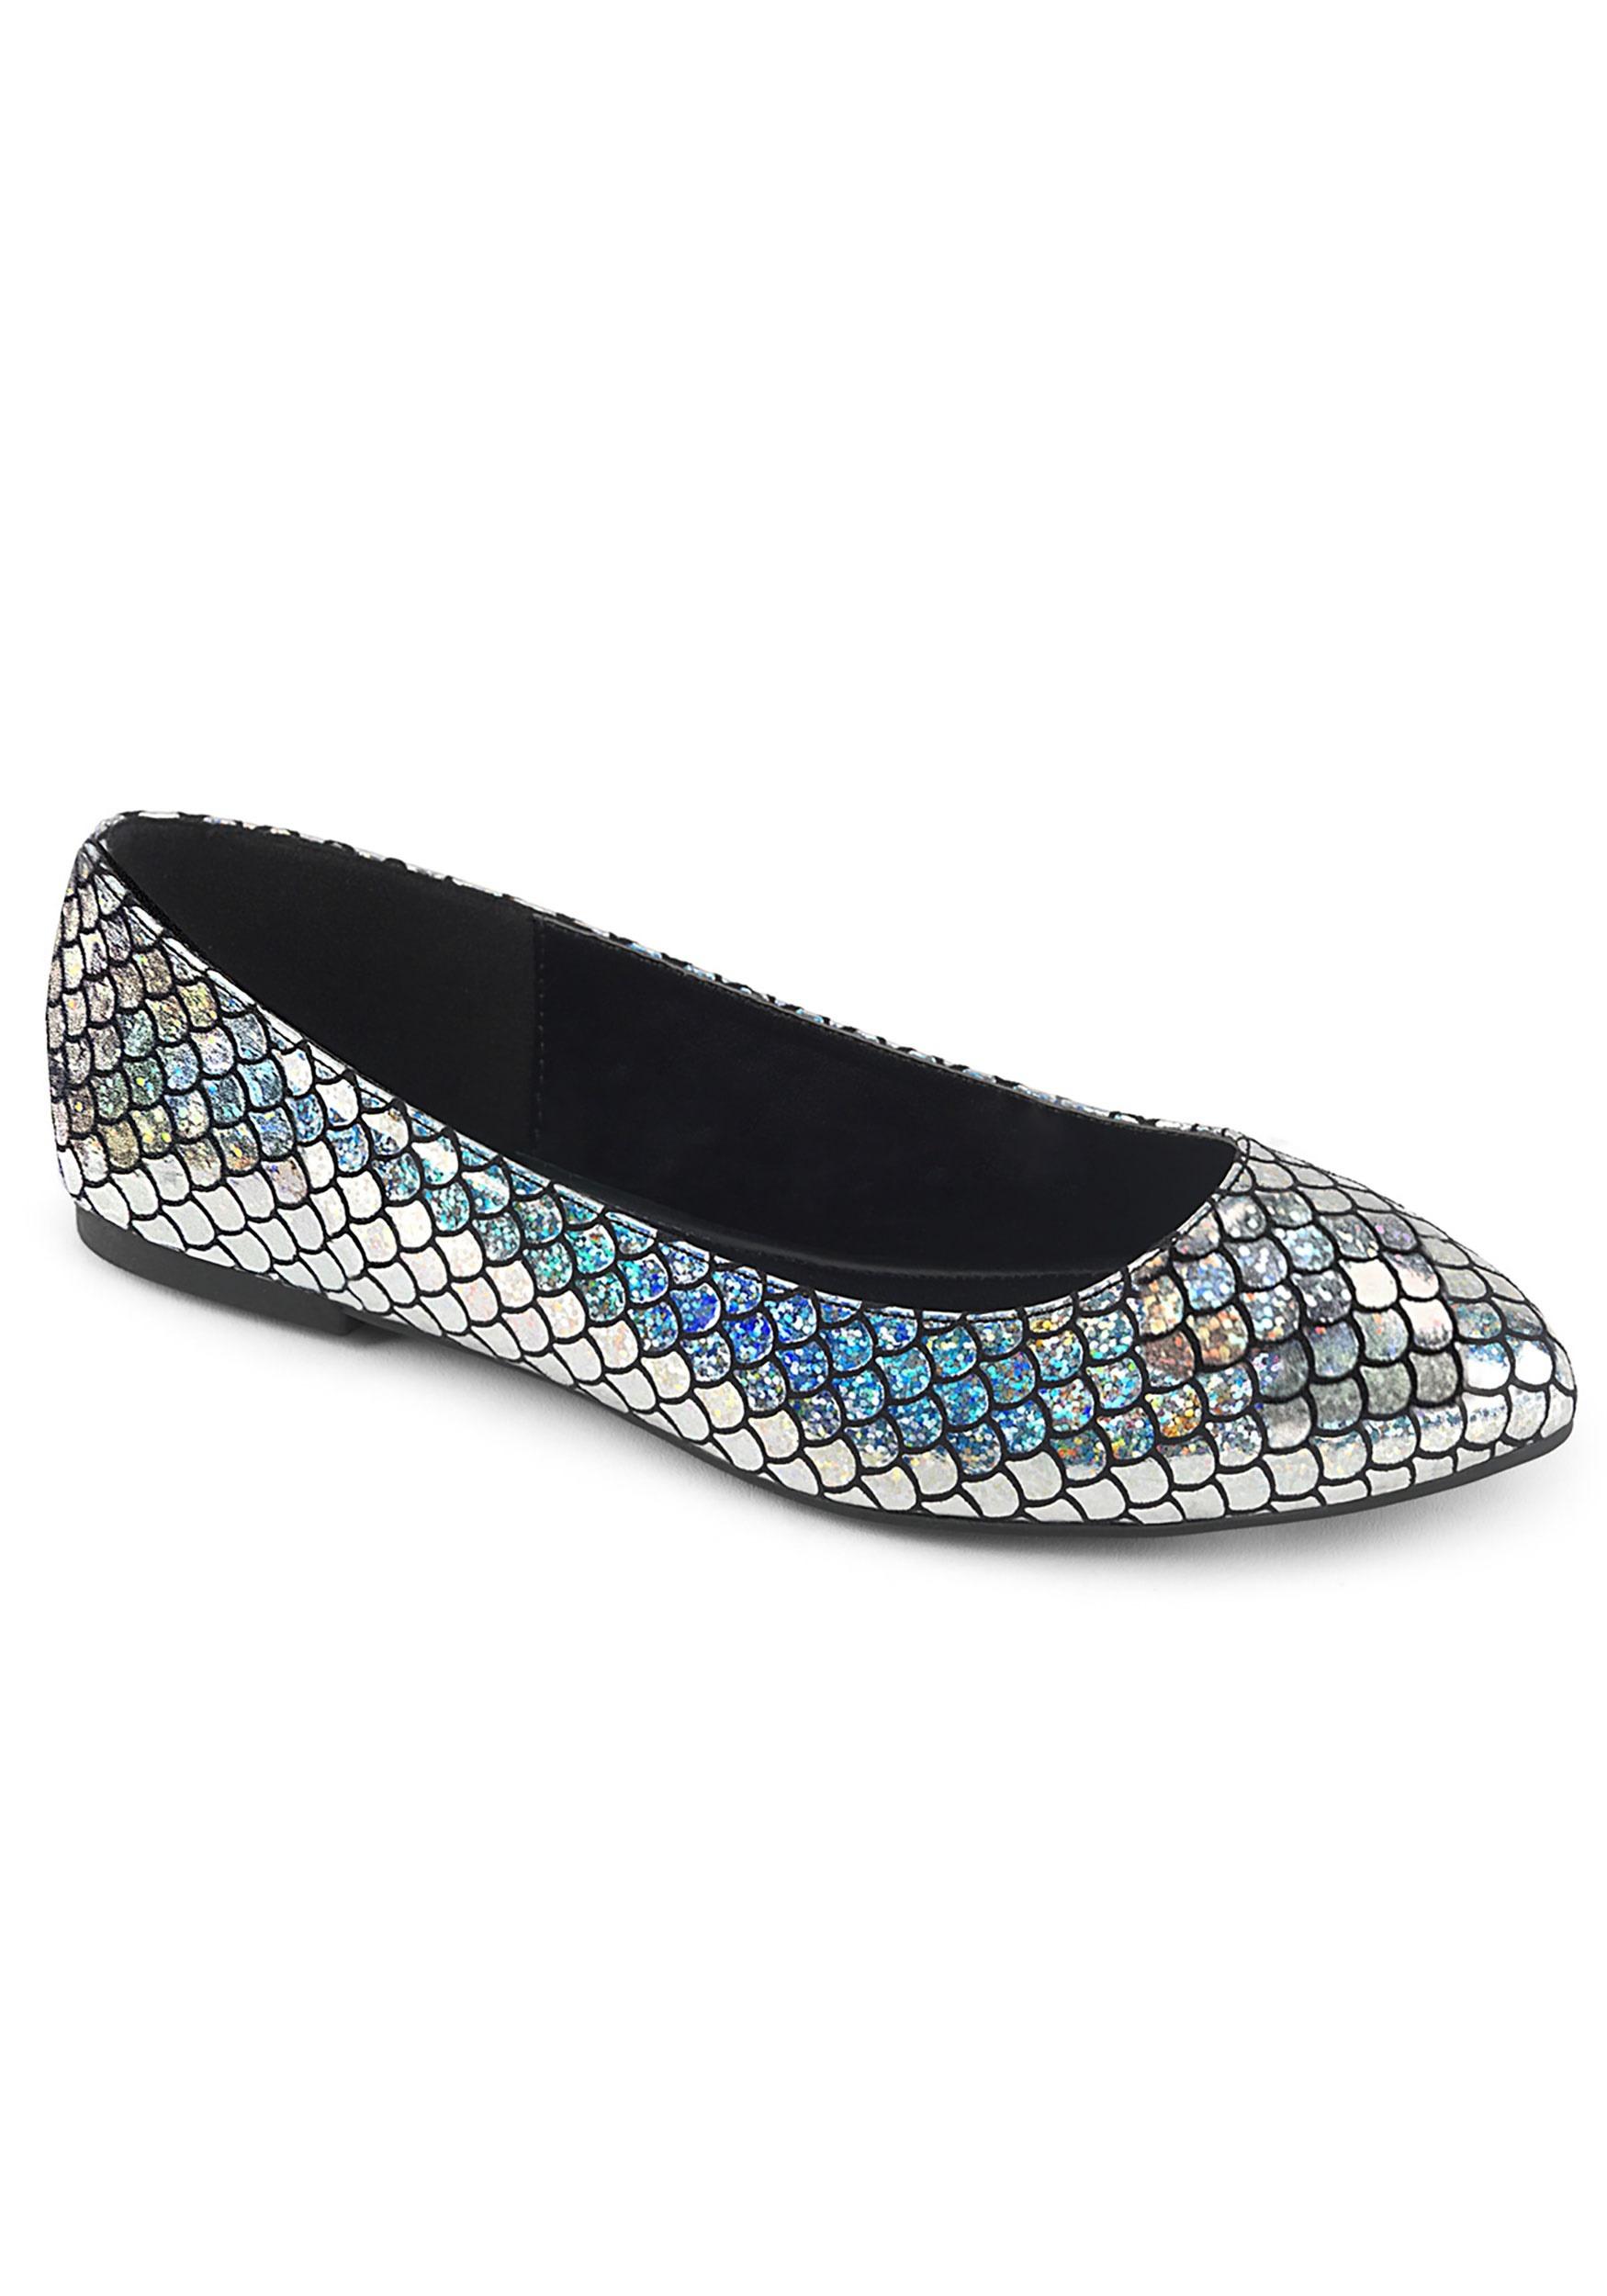 Silver Mermaid Women's Shoes